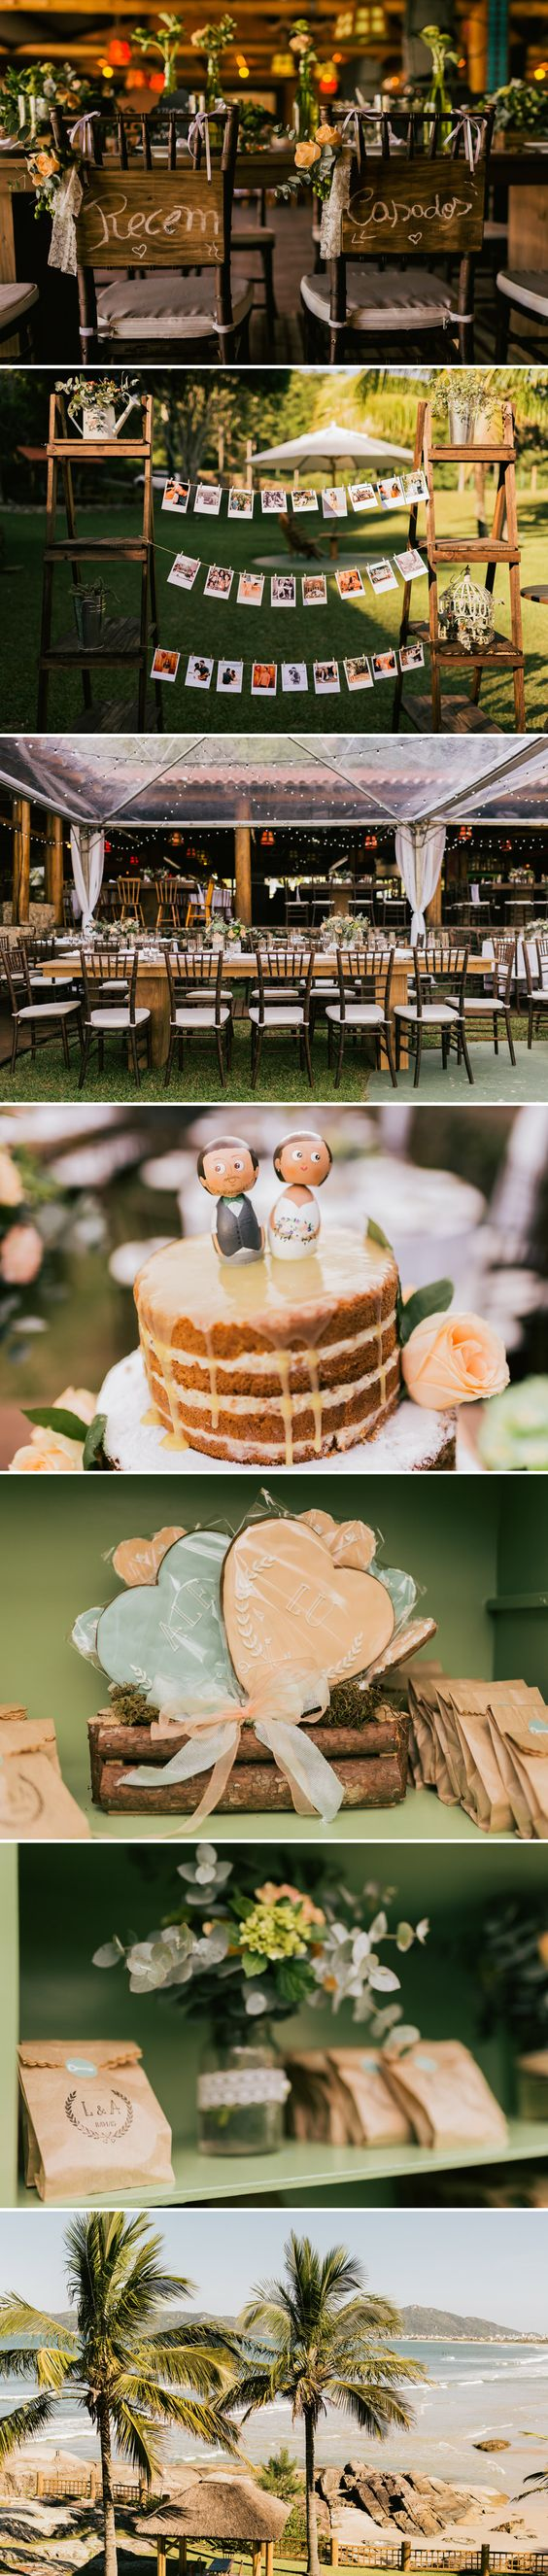 decoracao-festa-de-casamento-pequena-20-fotos-para-voce-se-inpirar-18